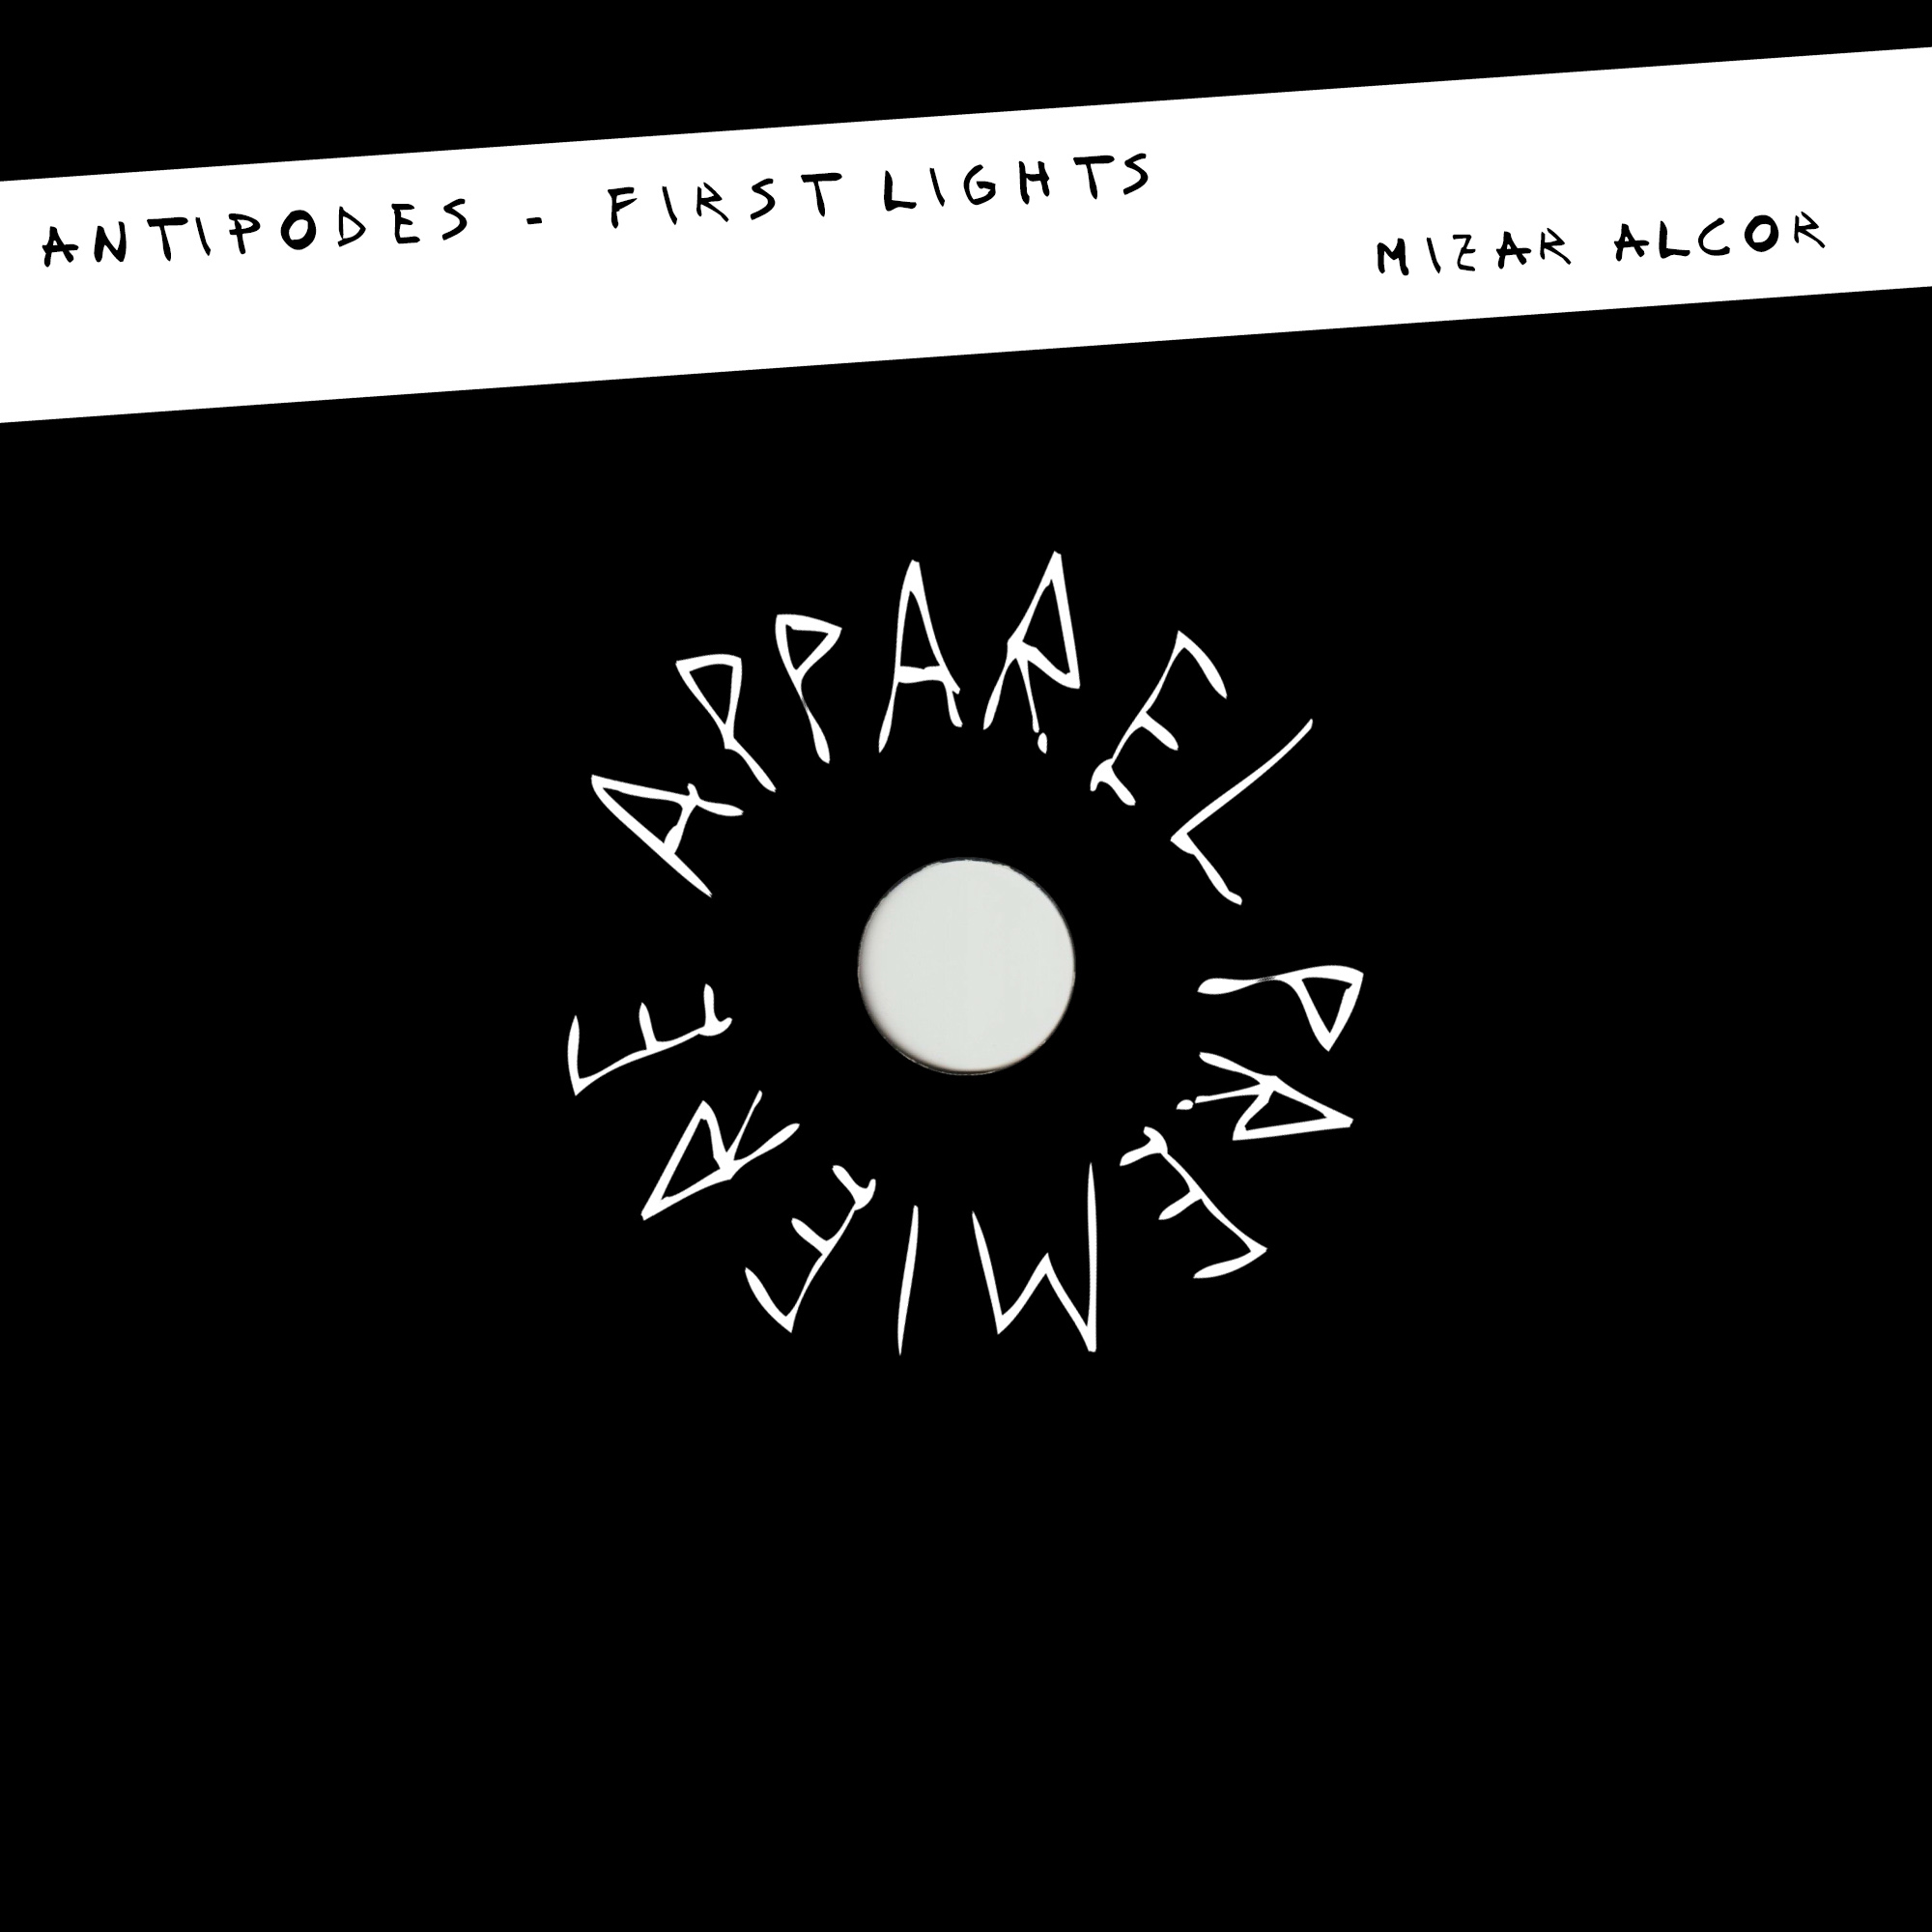 APPAREL PREMIERE: Antipodes – First Lights [Mizar Alcor]